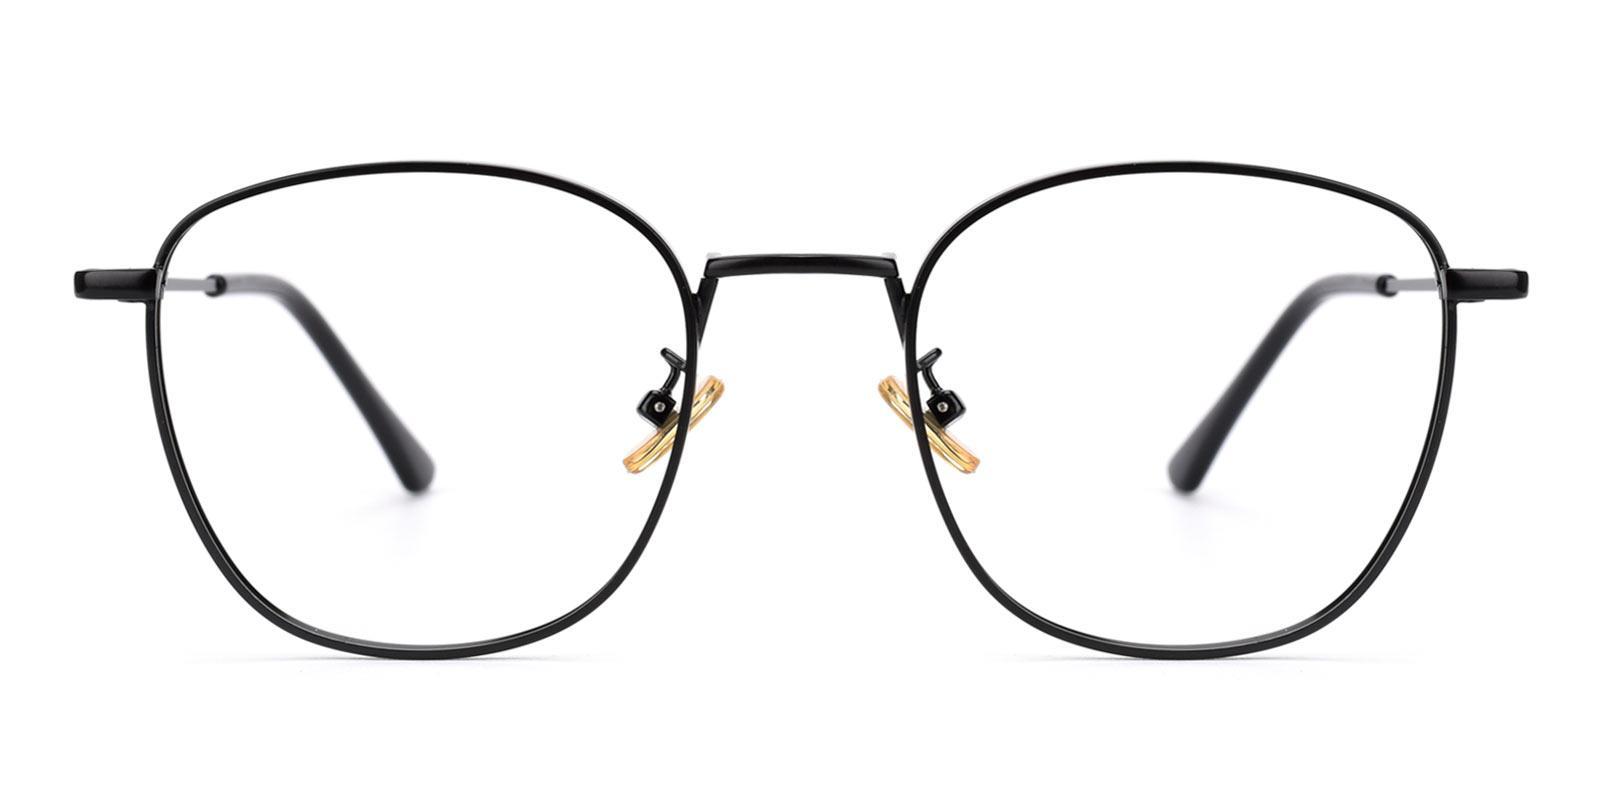 Richard-Black-Square-Metal-Eyeglasses-detail